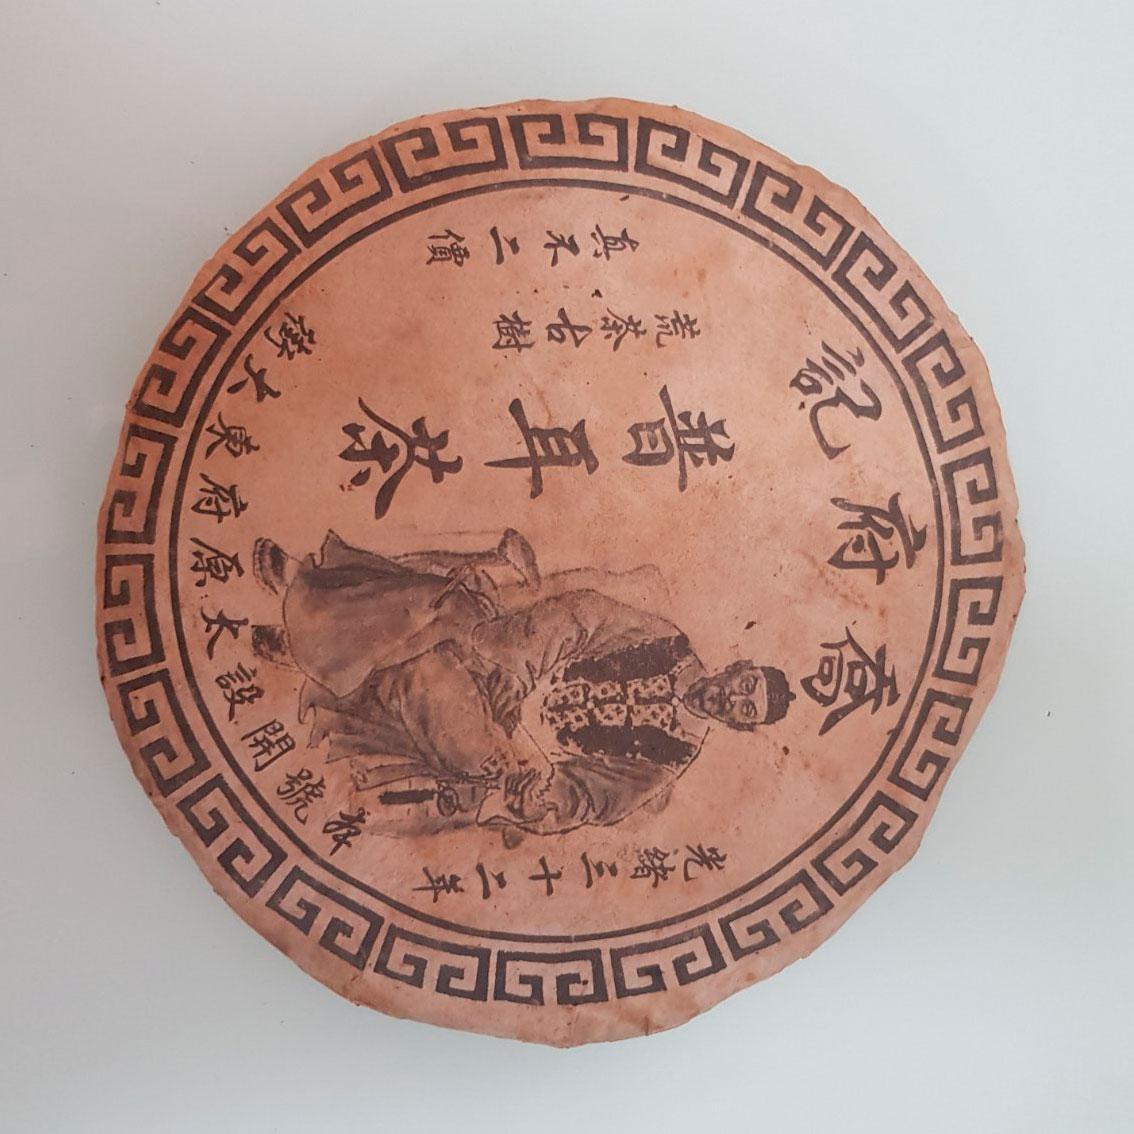 Китайський пуер Fu Ji Pu er Tea (1964 рік)